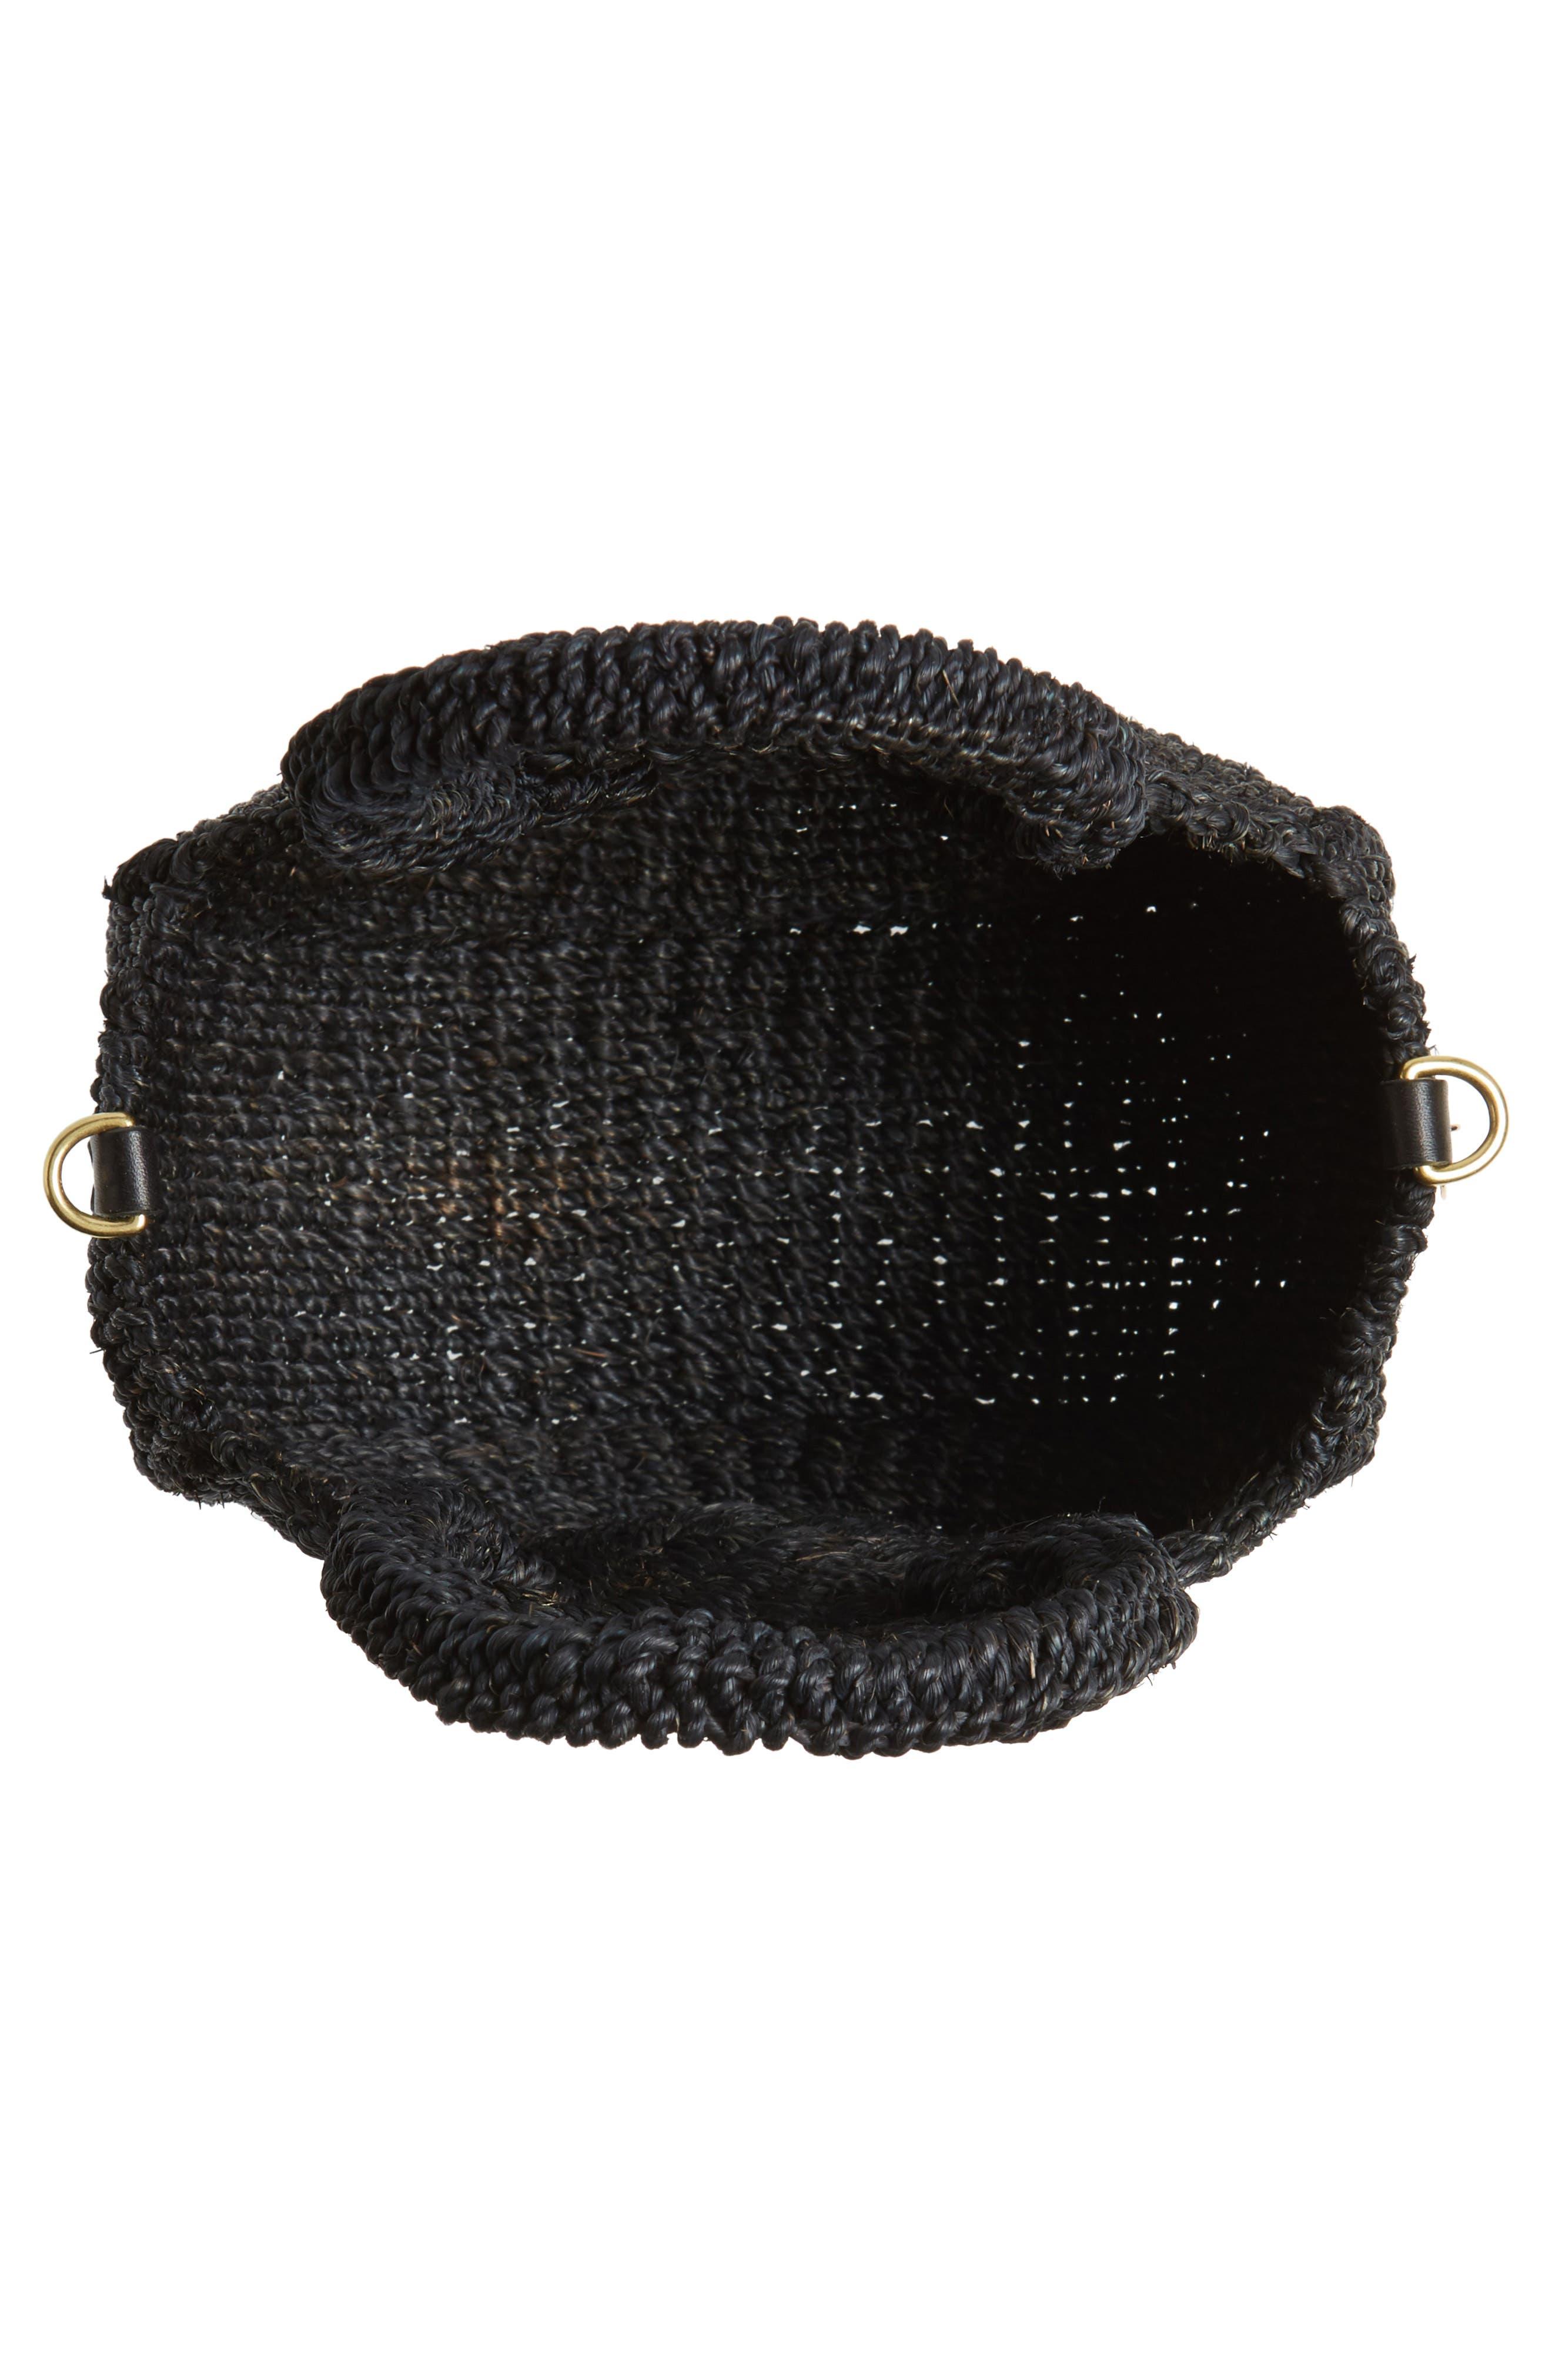 Petite Alice Straw Bag,                             Alternate thumbnail 4, color,                             BLACK WOVEN